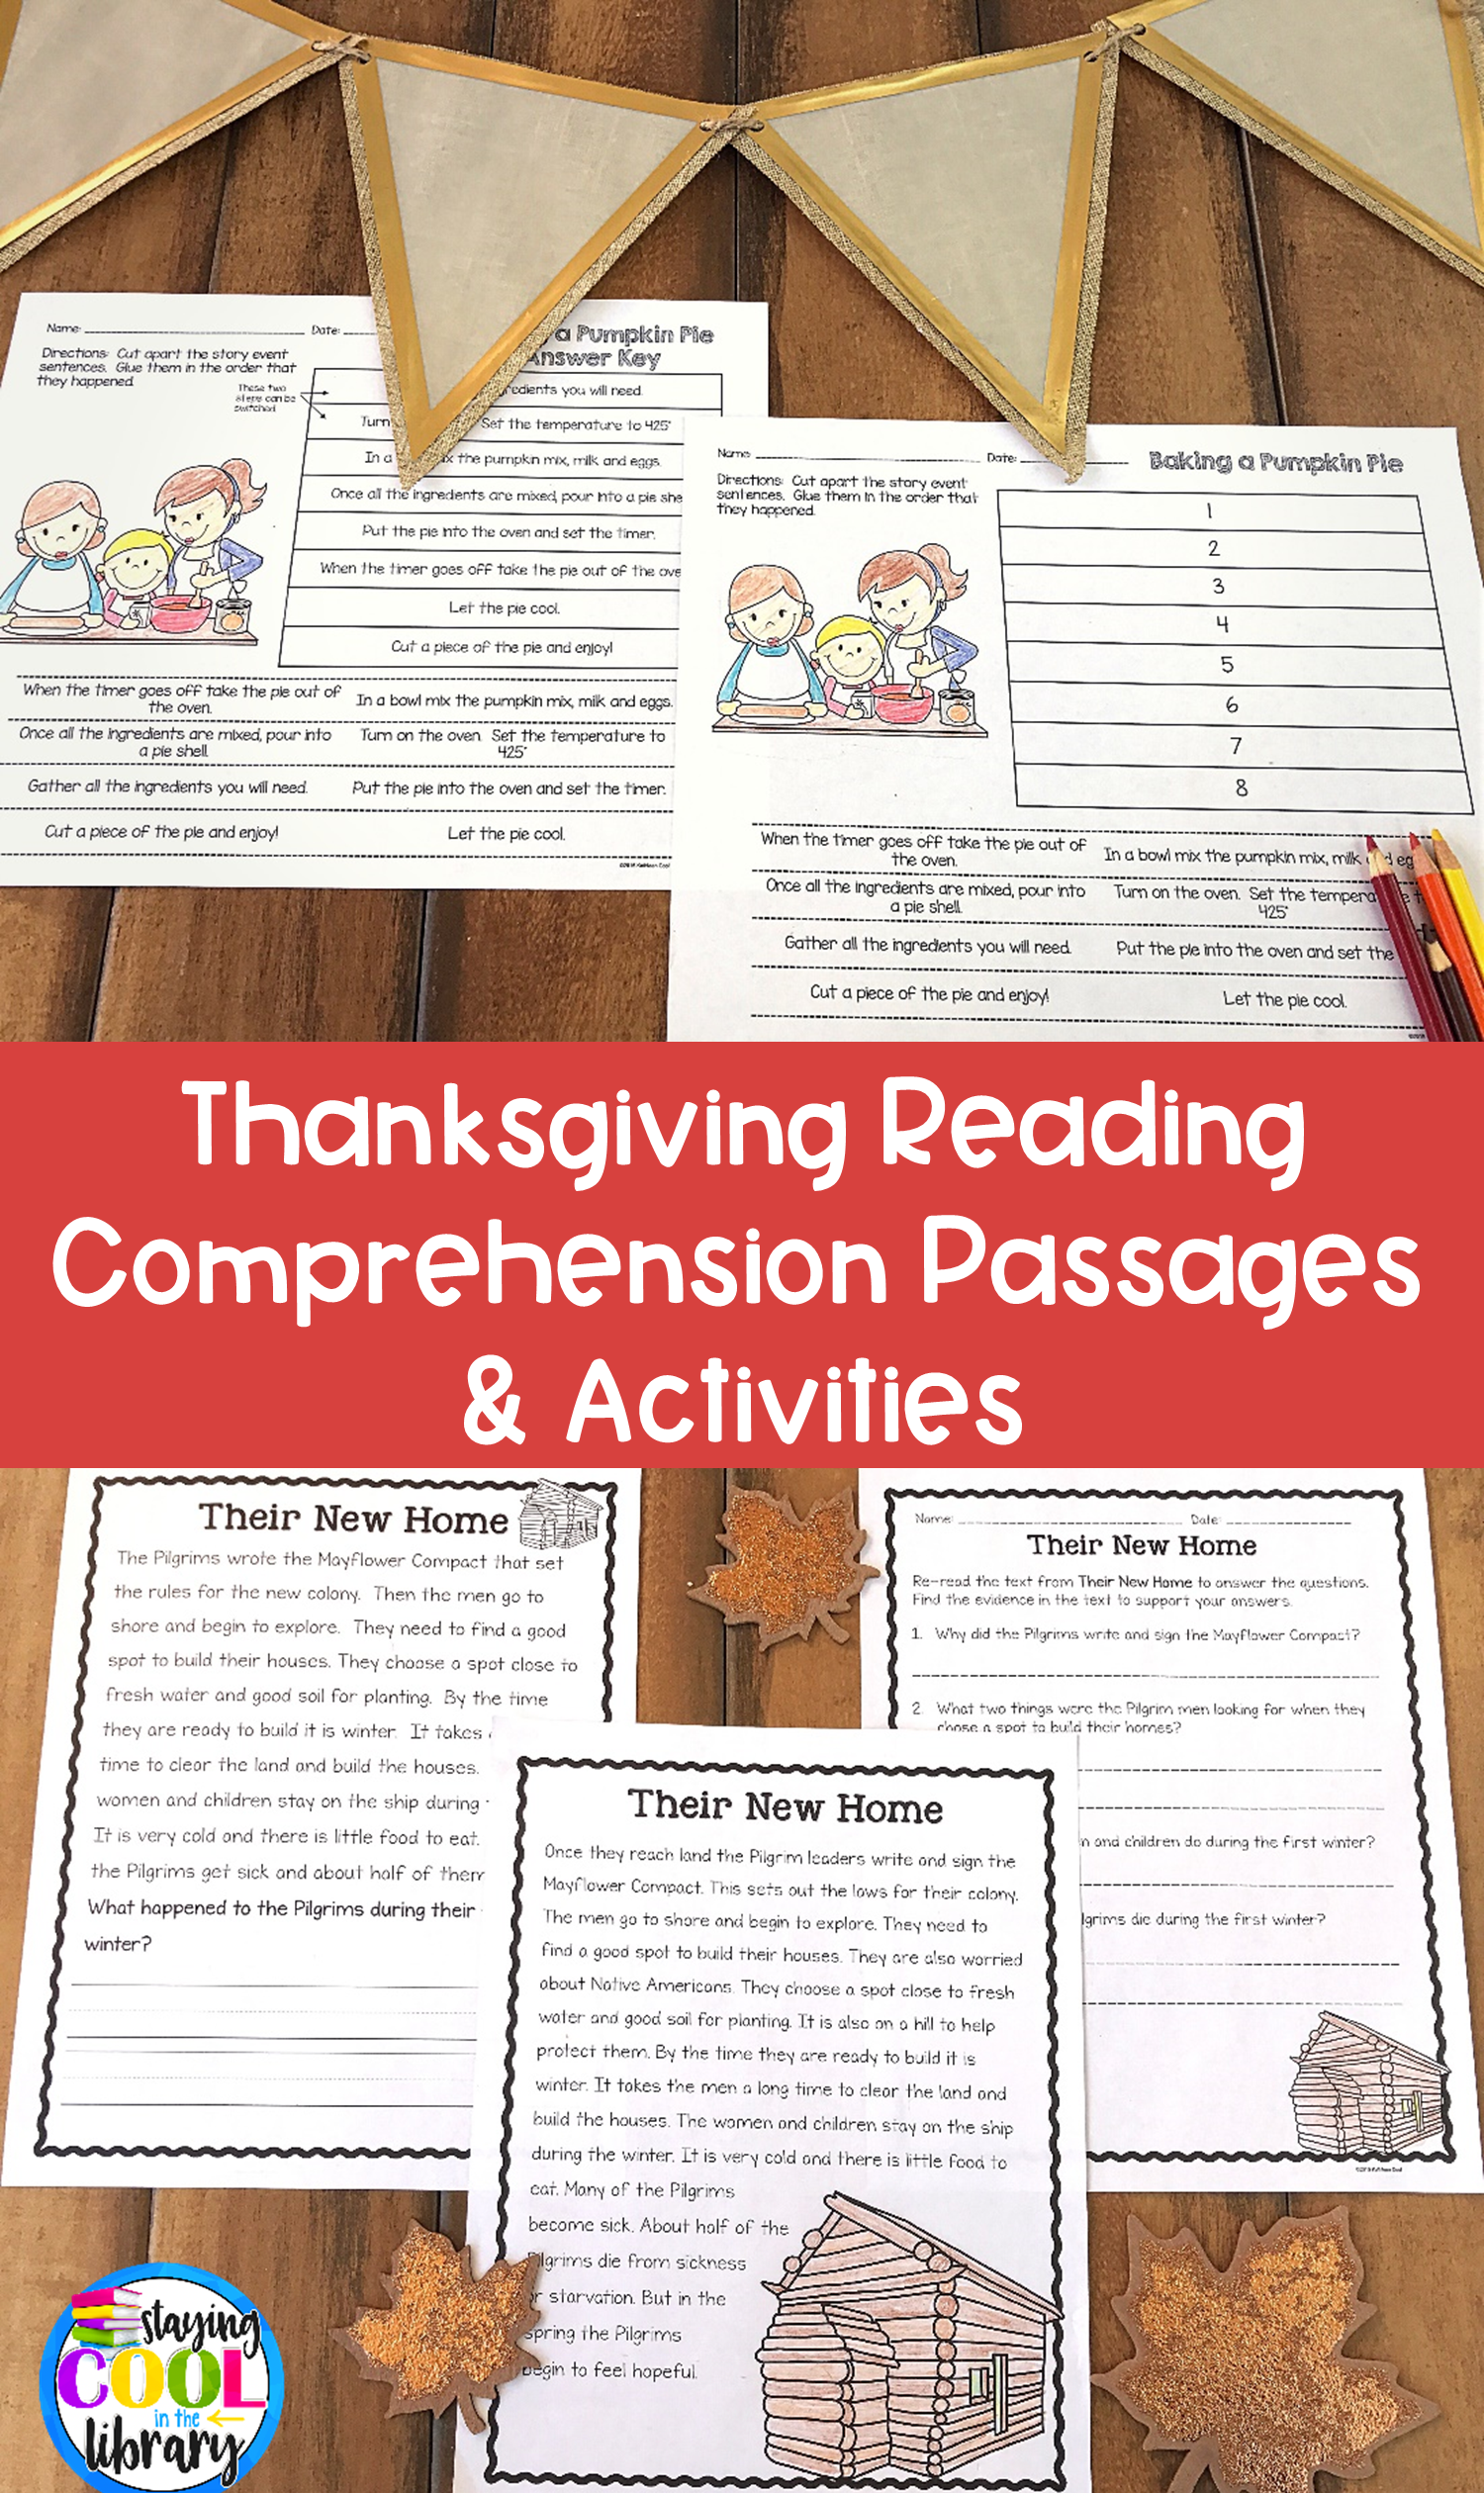 Thanksgiving Reading Comprehension Passages And Activities Thanksgiving Reading Comprehension Reading Comprehension Passages Comprehension Passage [ 2520 x 1500 Pixel ]